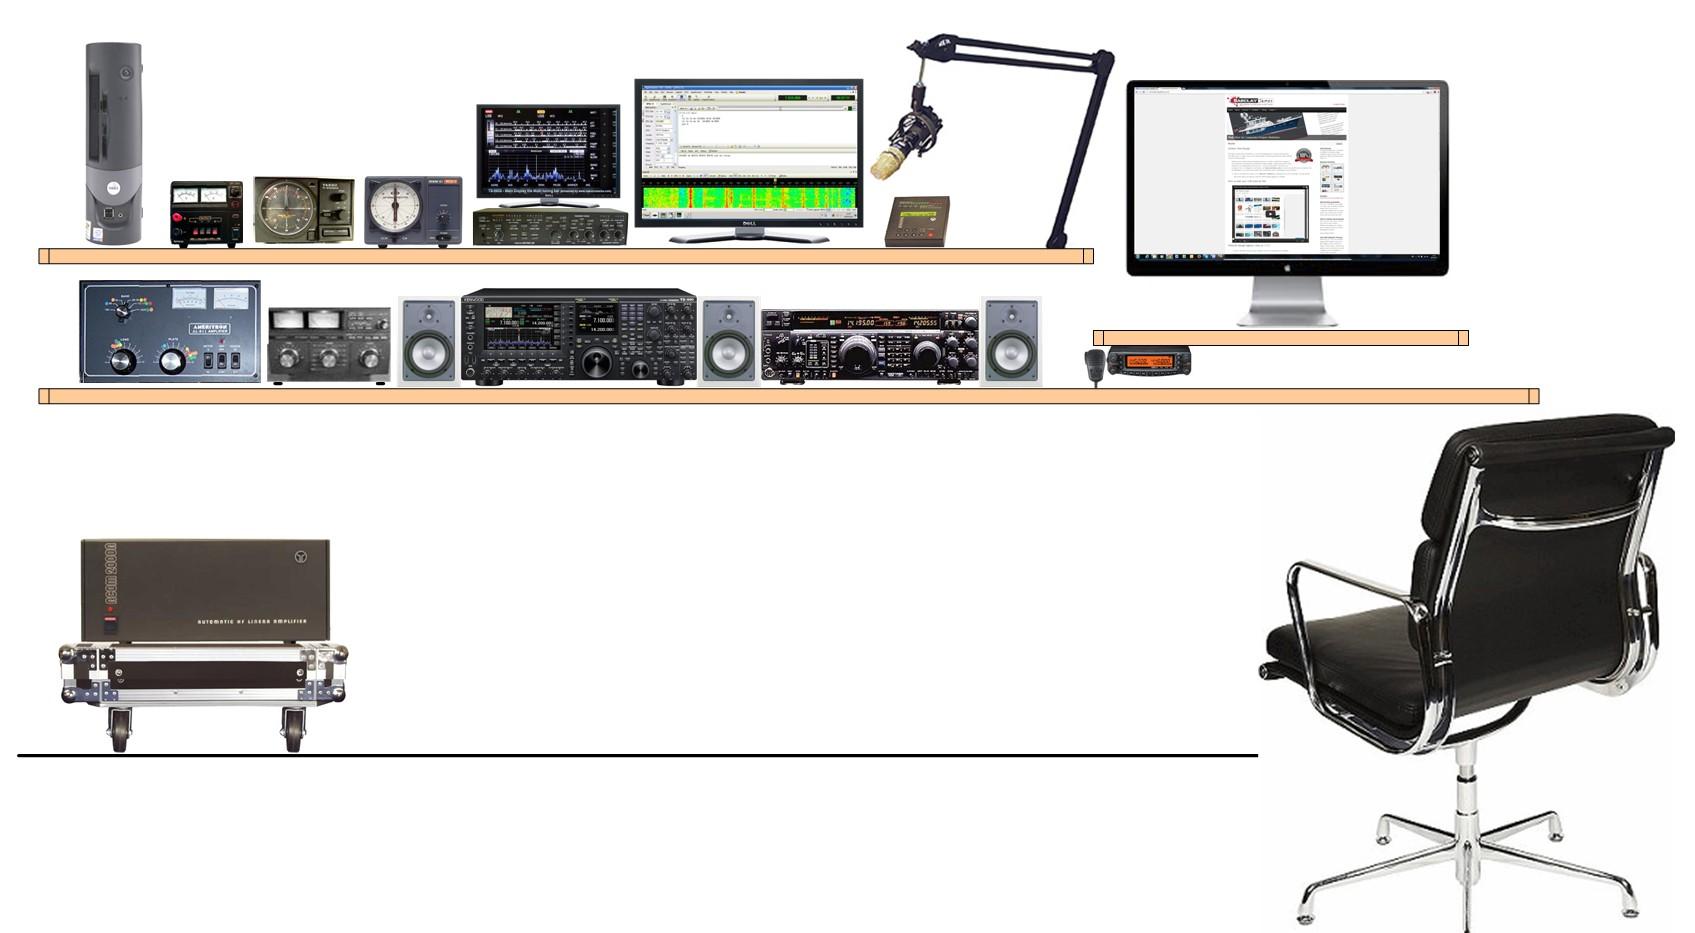 Designing A Radio Ham Shack M0mcx The Home Of Dx